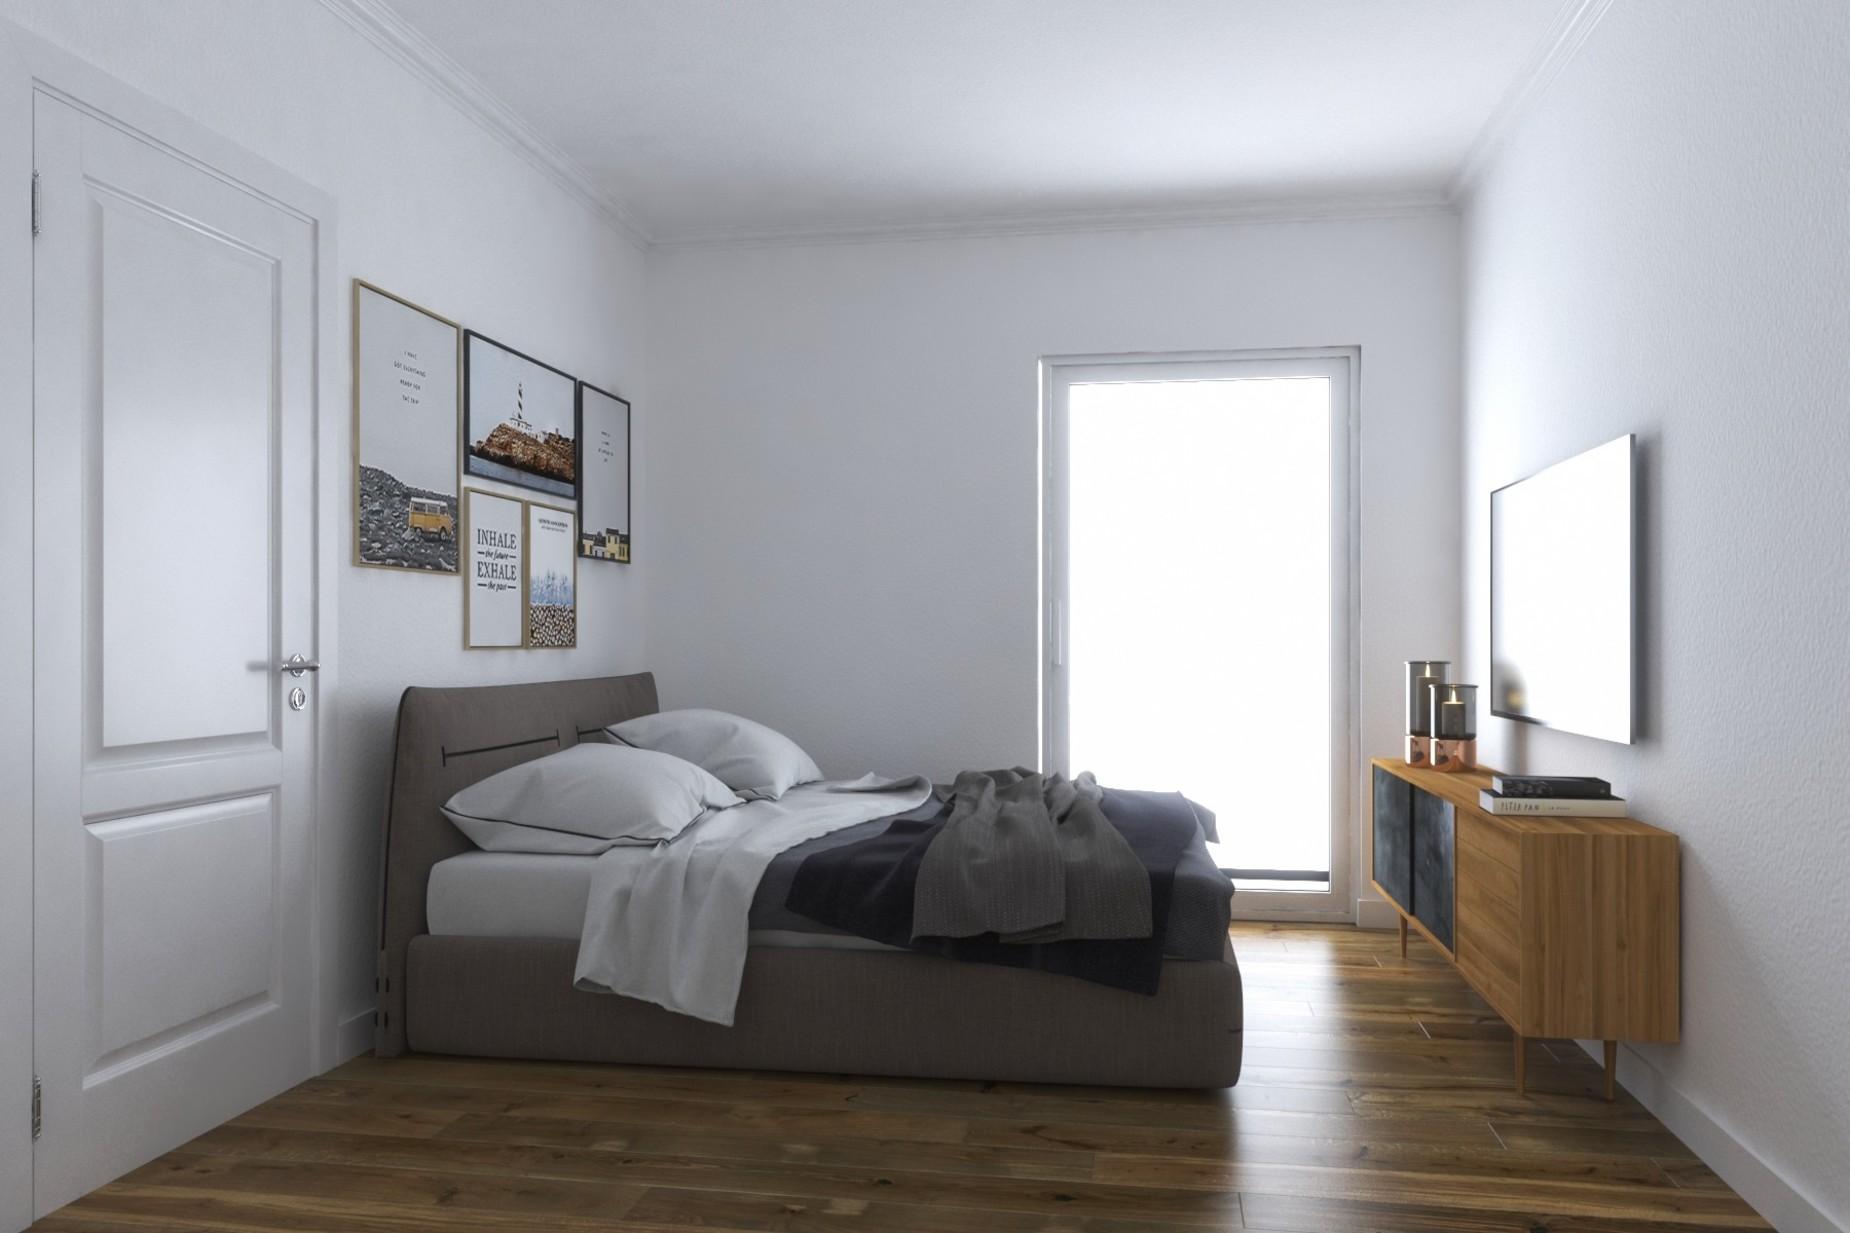 2 bed Maisonette For Sale in Birkirkara, Birkirkara - thumb 5